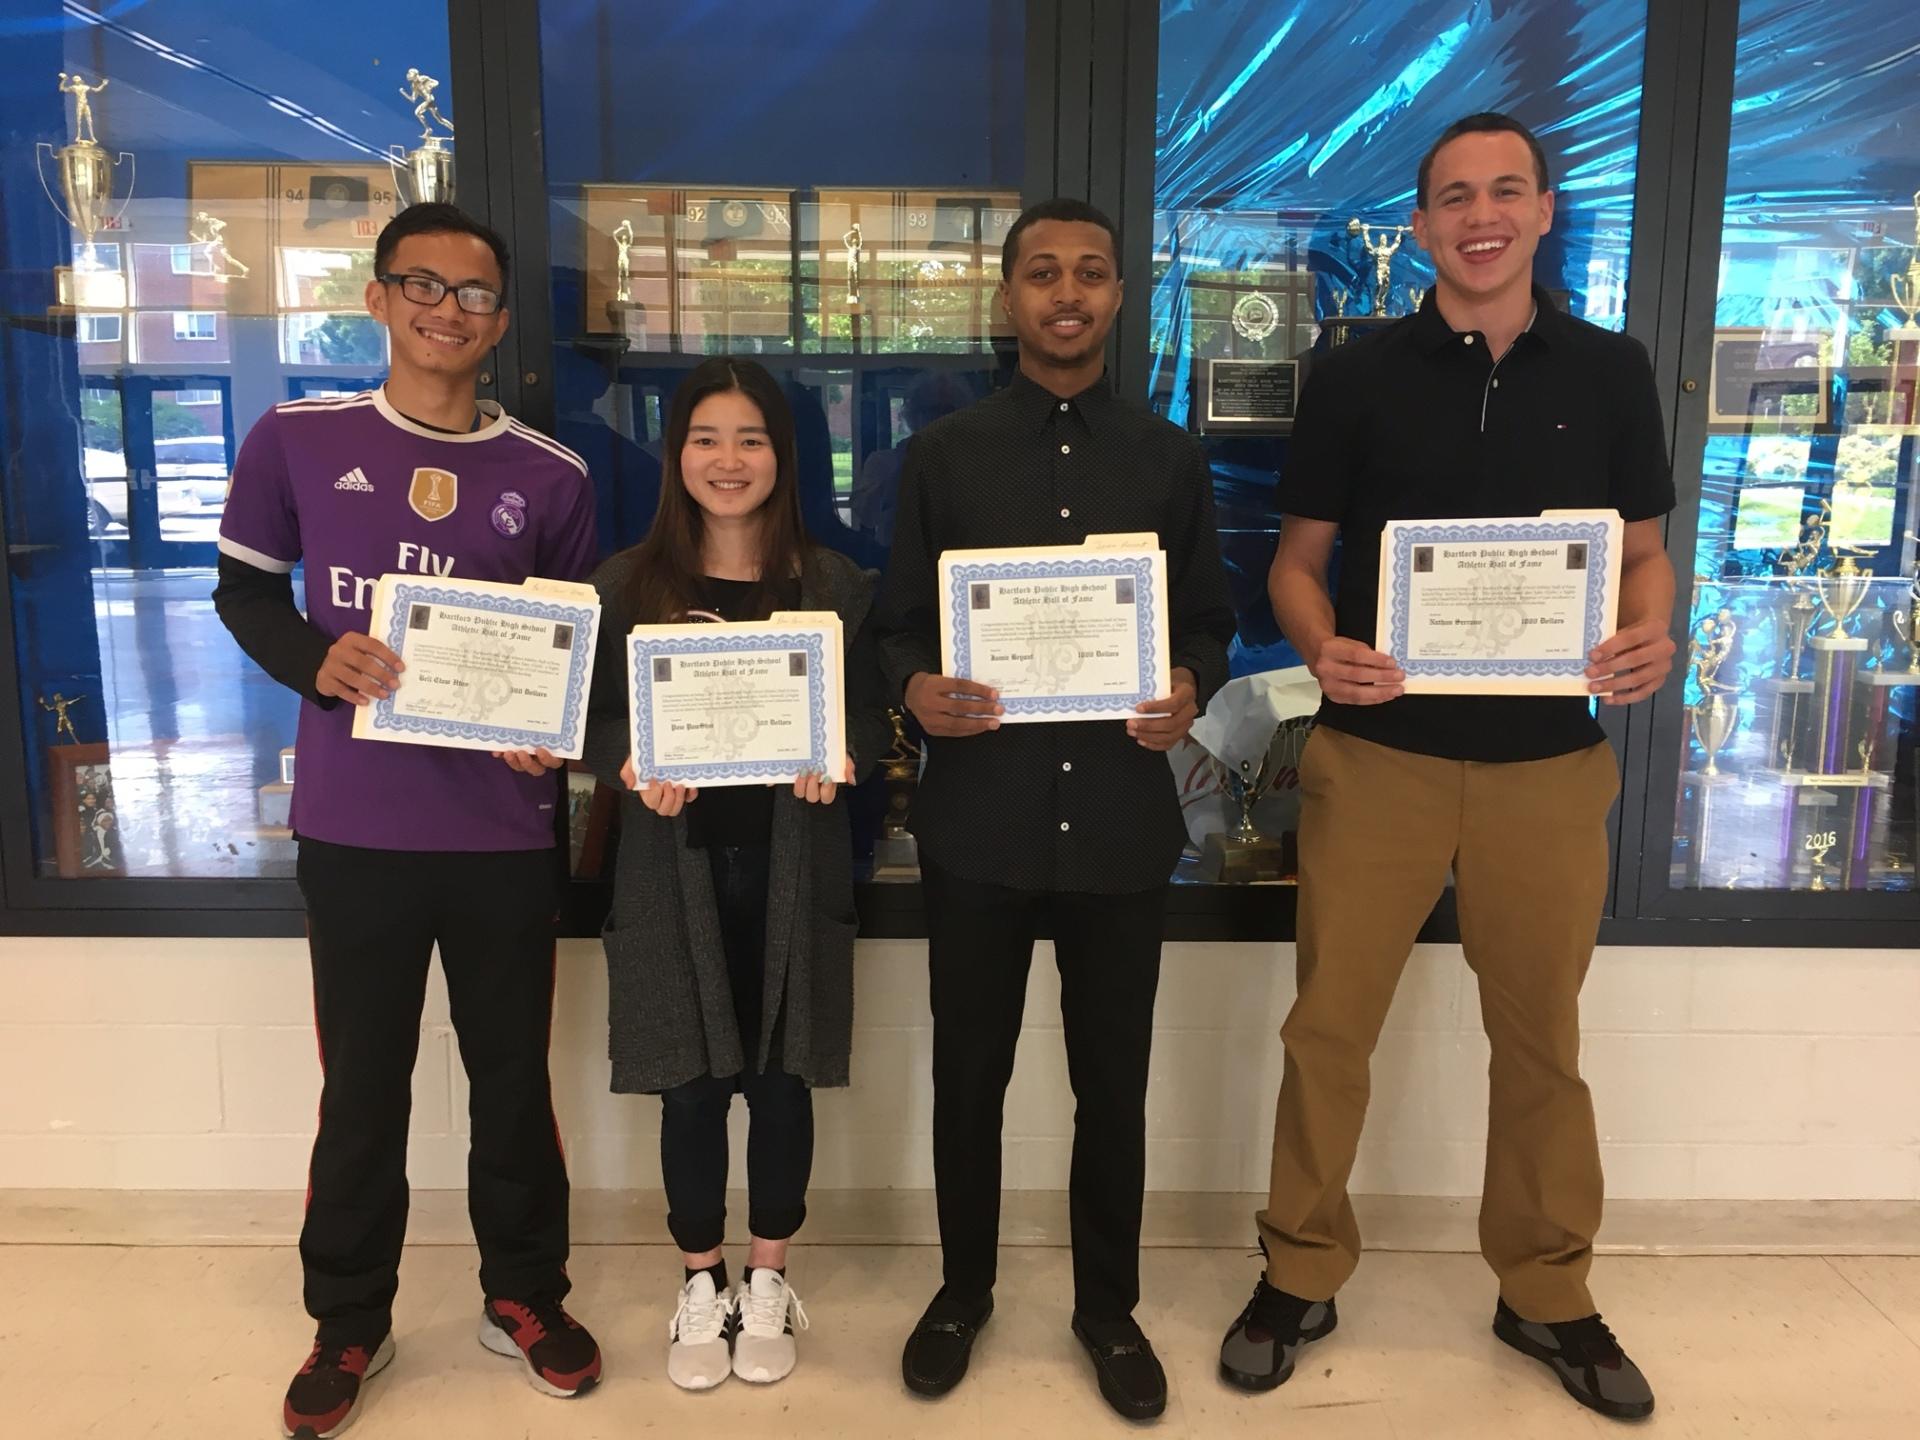 2017 Scholarship Presentation June 8th, 2017